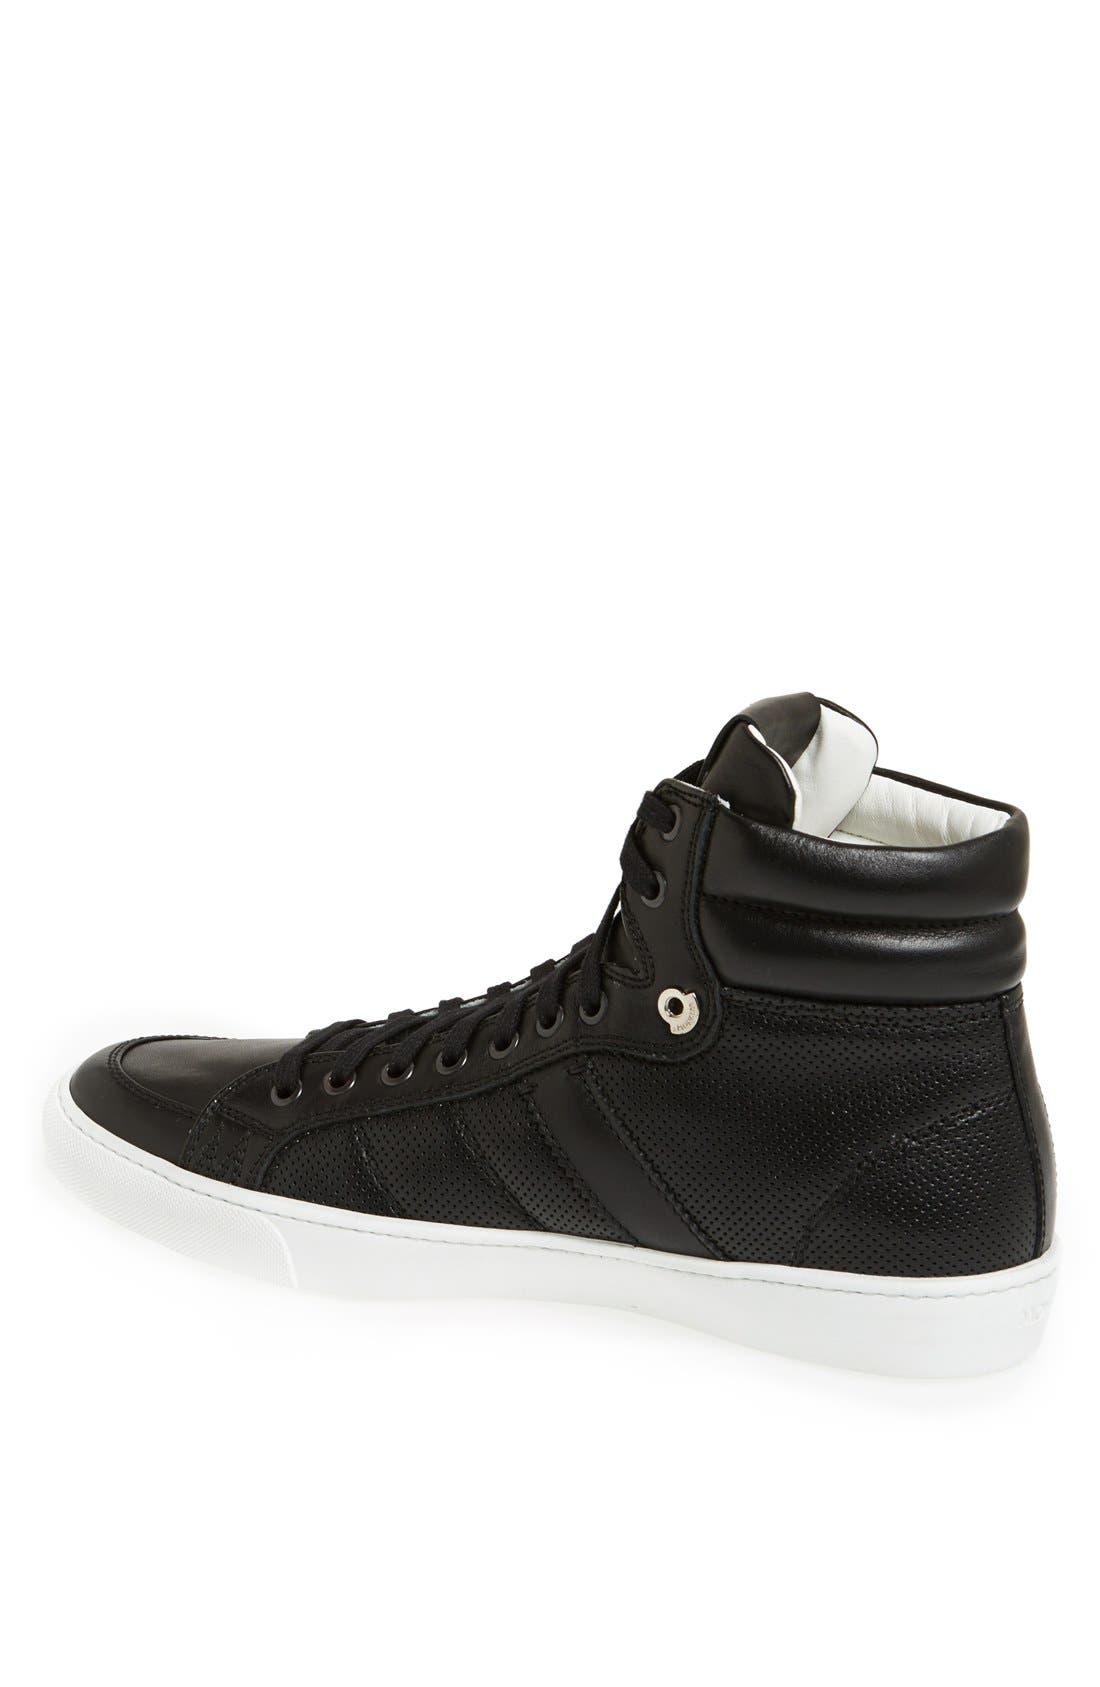 Alternate Image 2  - Moncler 'Lyon' Sneaker (Men)